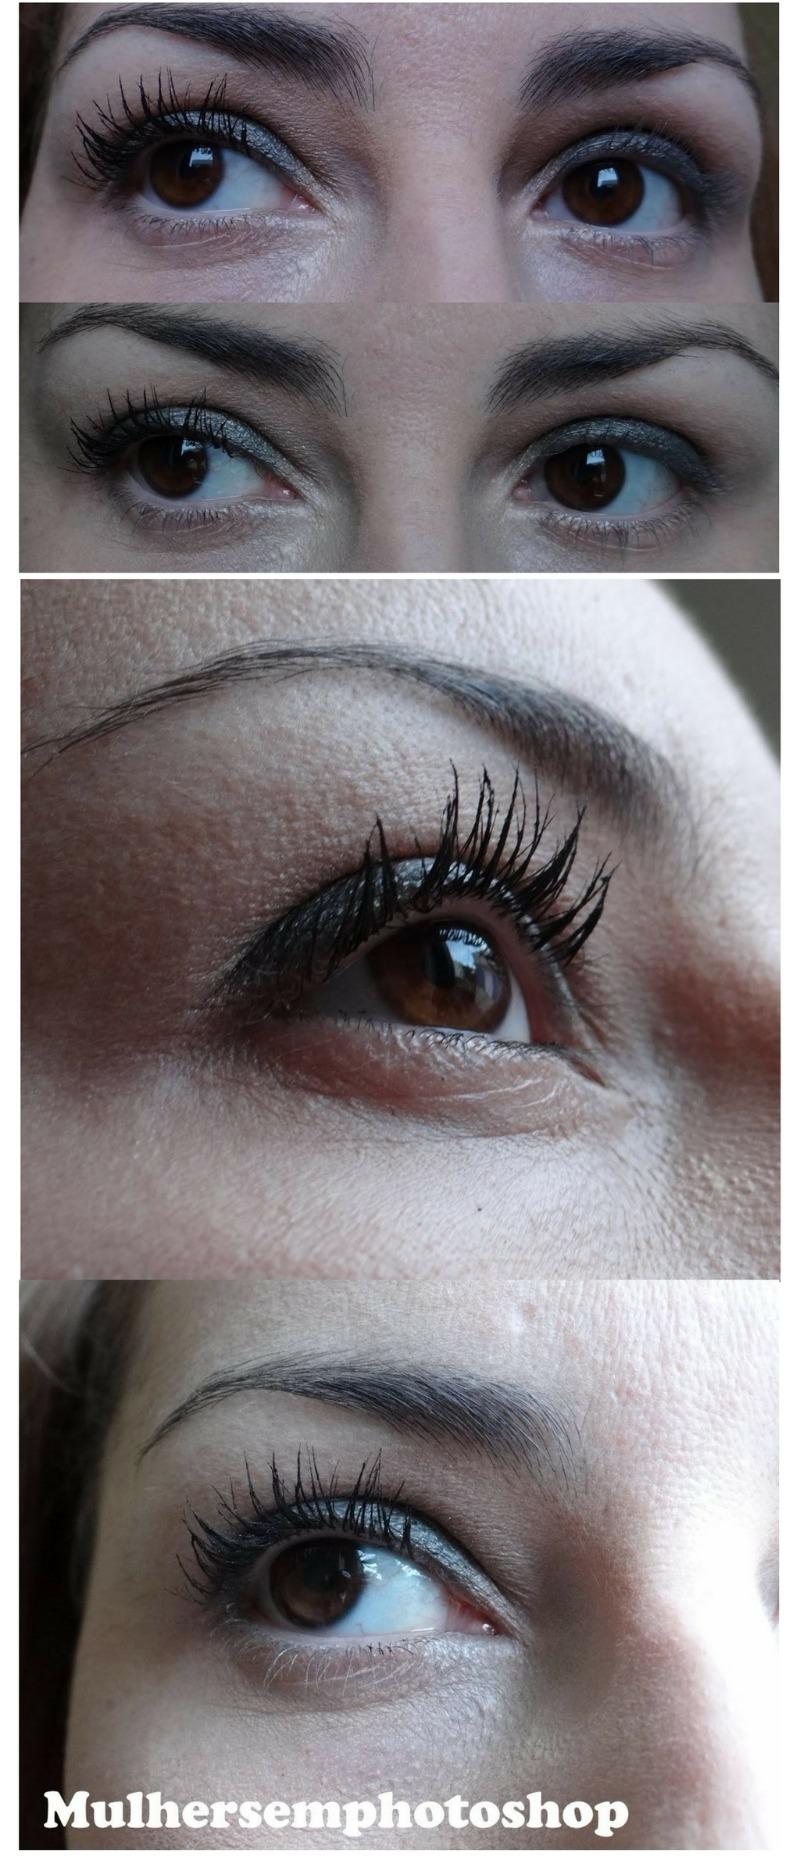 Máscara de cílios Hypnose Lancome - resenha